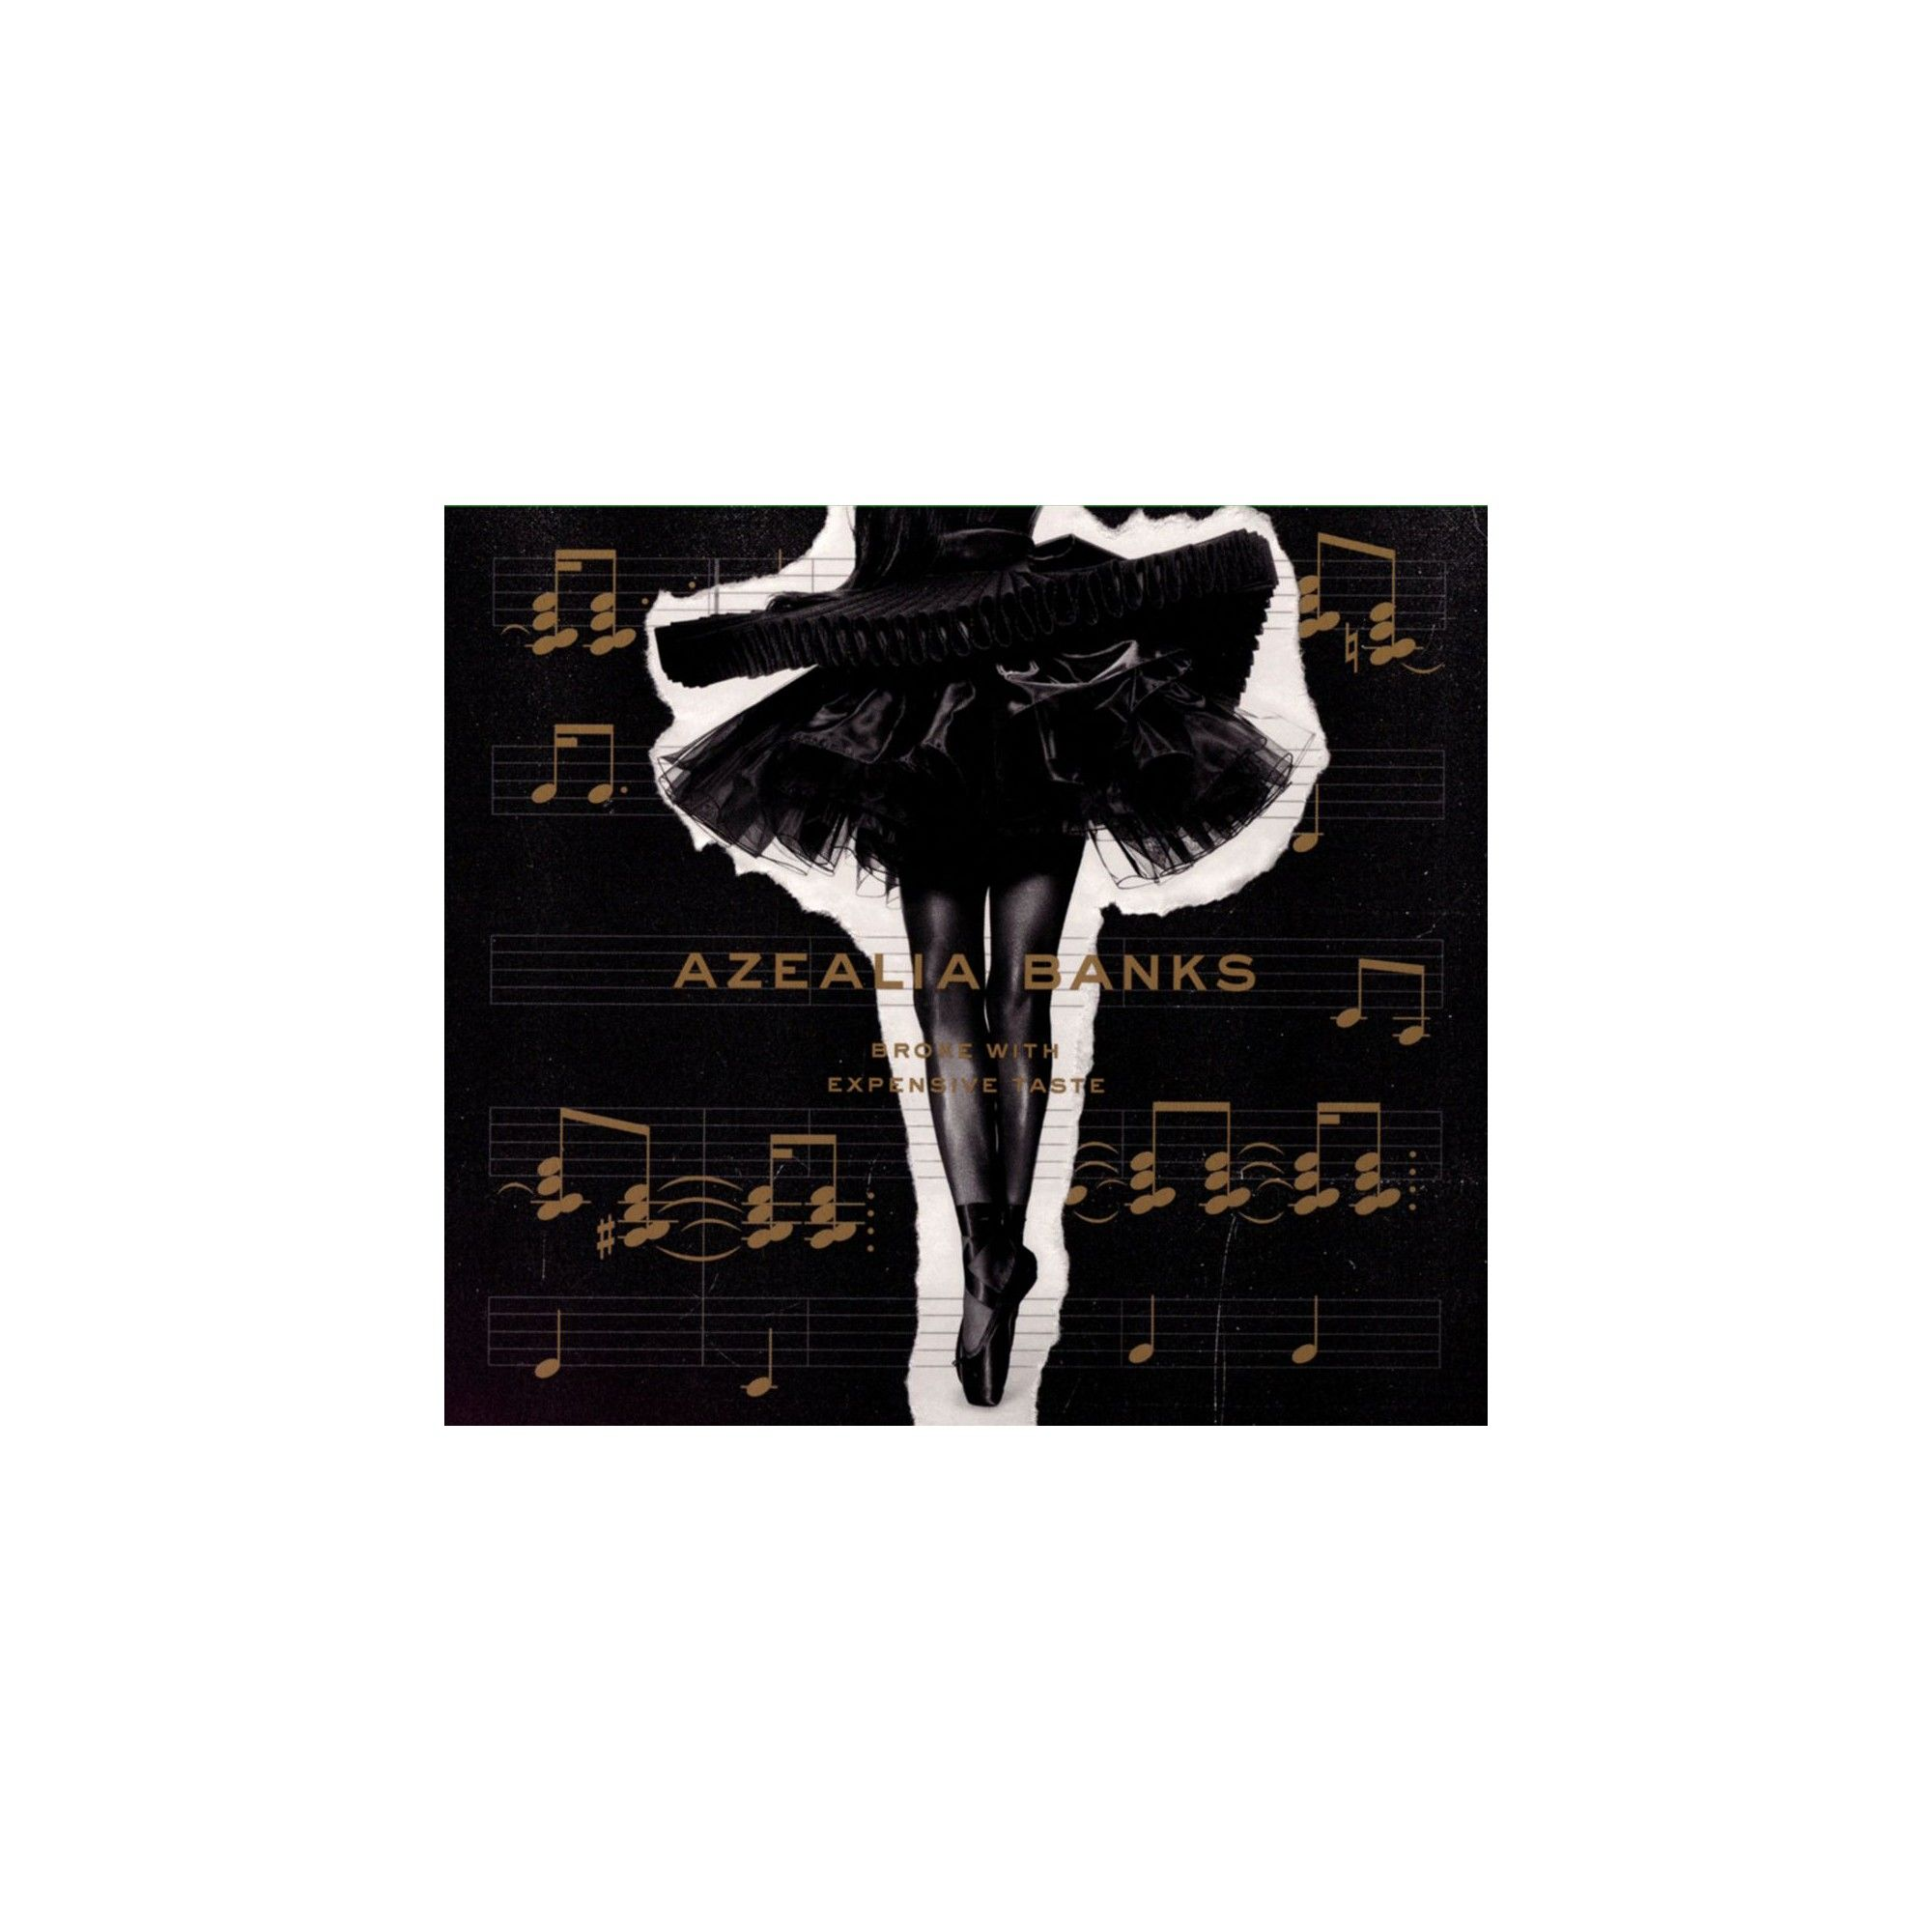 Azealia Banks - Broke With Expensive Taste (Vinyl) | Expensive taste, Vinyl,  Azealia banks